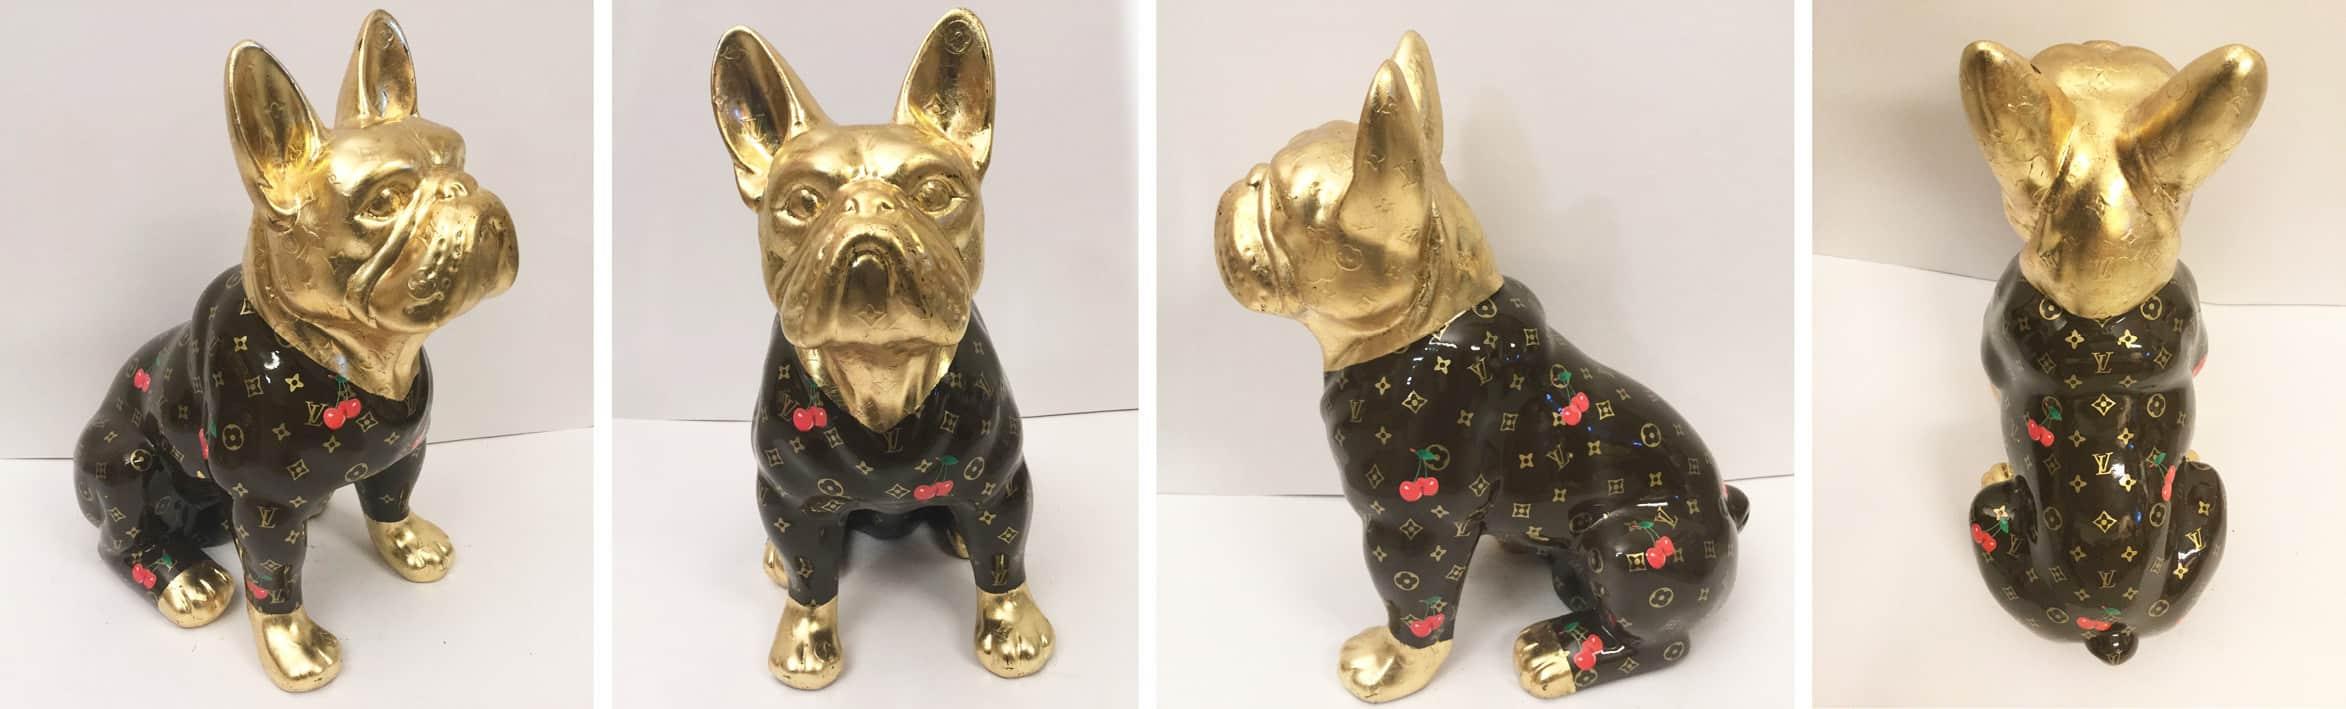 Ewa Sibilska - Brown Louis Vuitton Dog